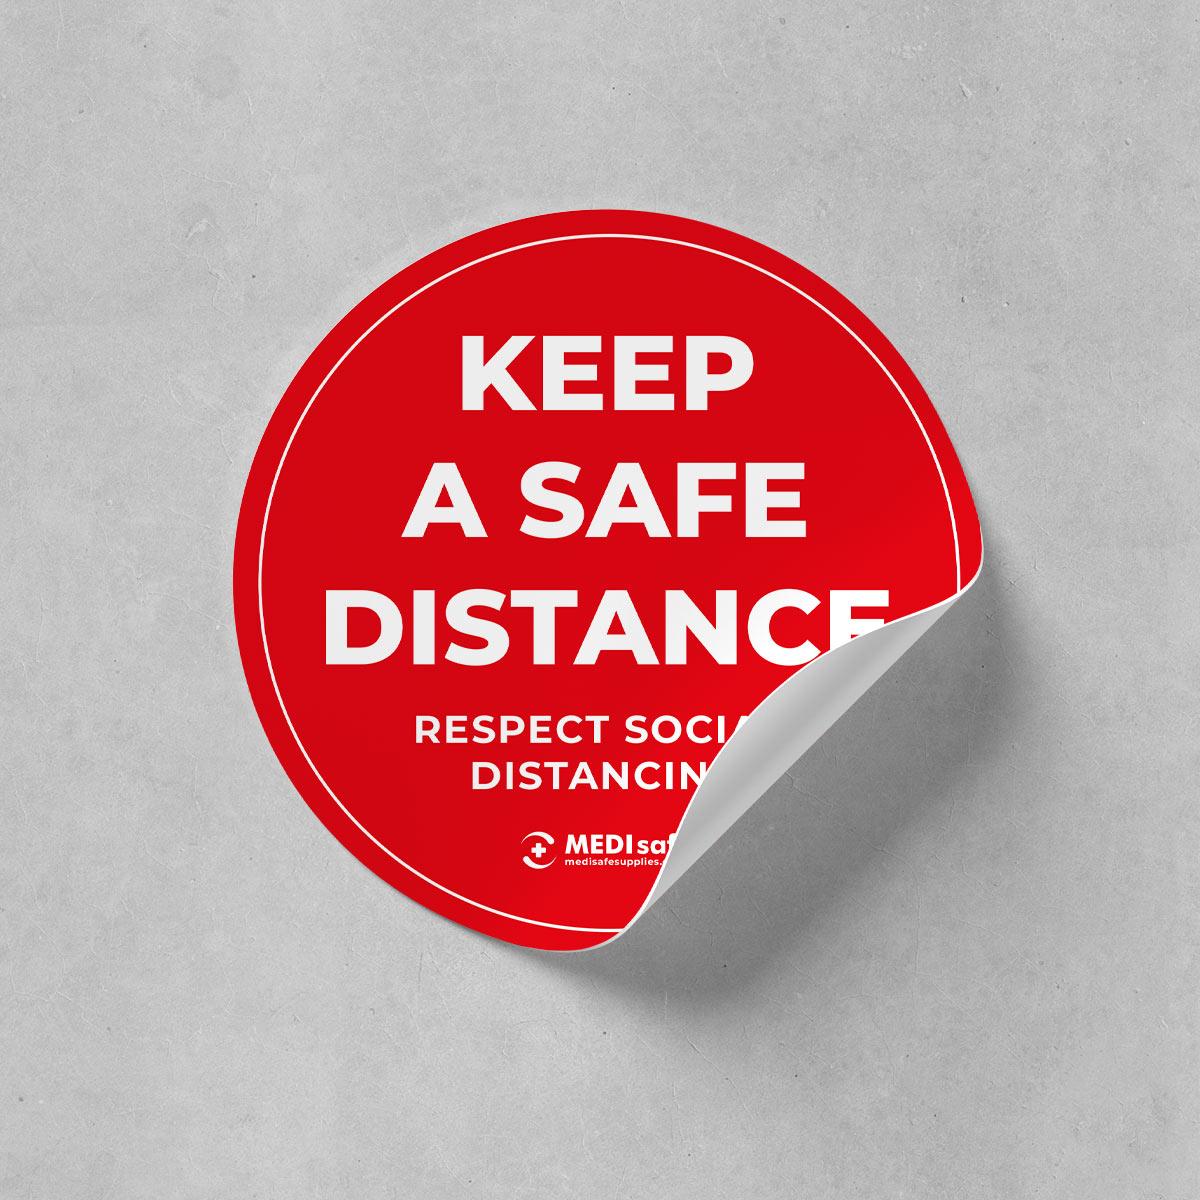 buy keep a safe distance floor stickers online